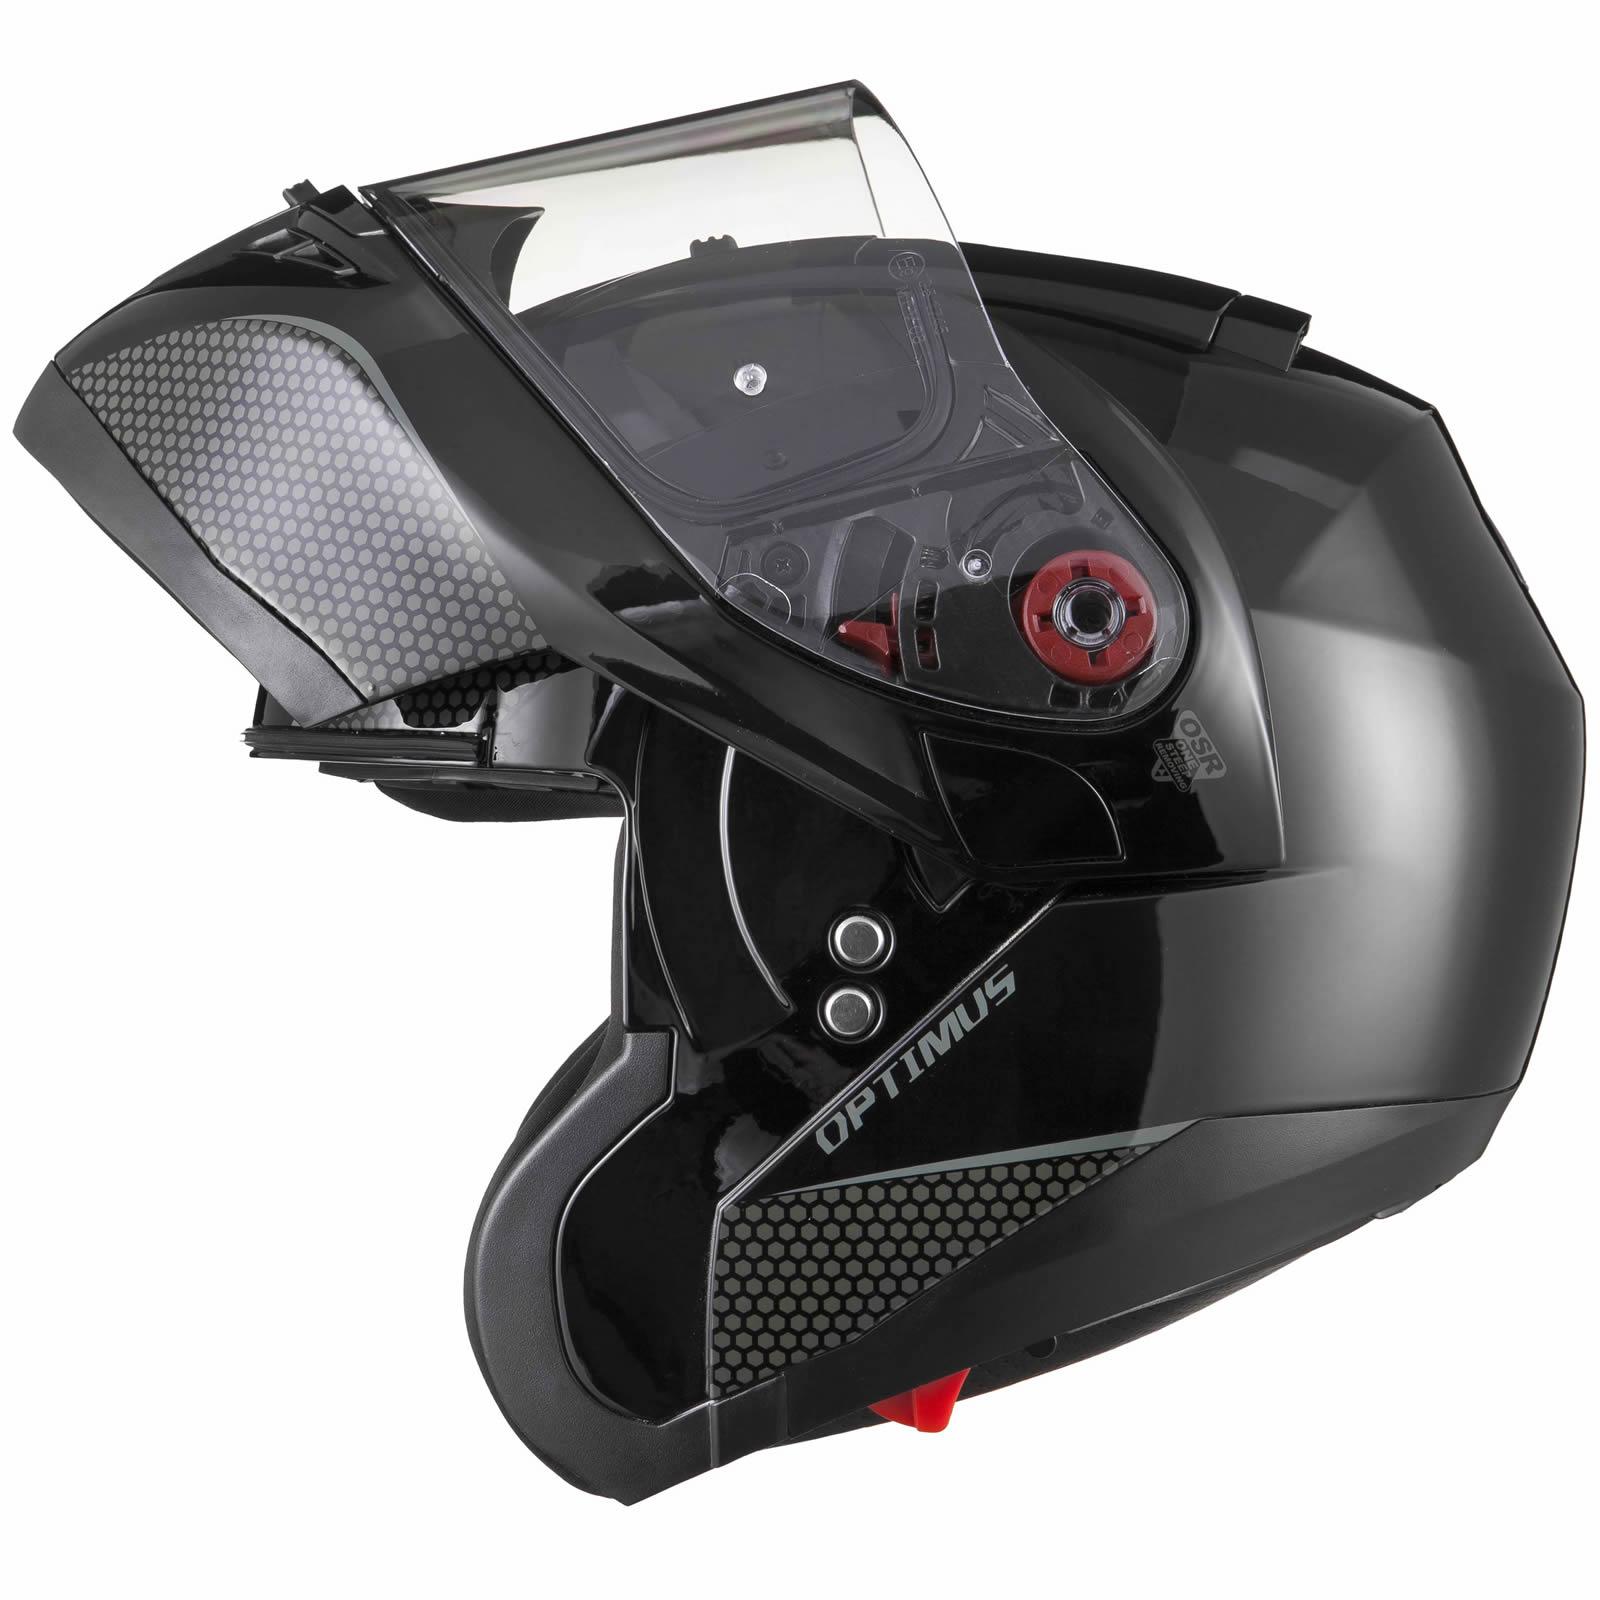 Black-Optimus-SV-Max-Vision-Flip-Up-Front-Motorcycle-Helmet-Pinlock-Ready-Visor thumbnail 15